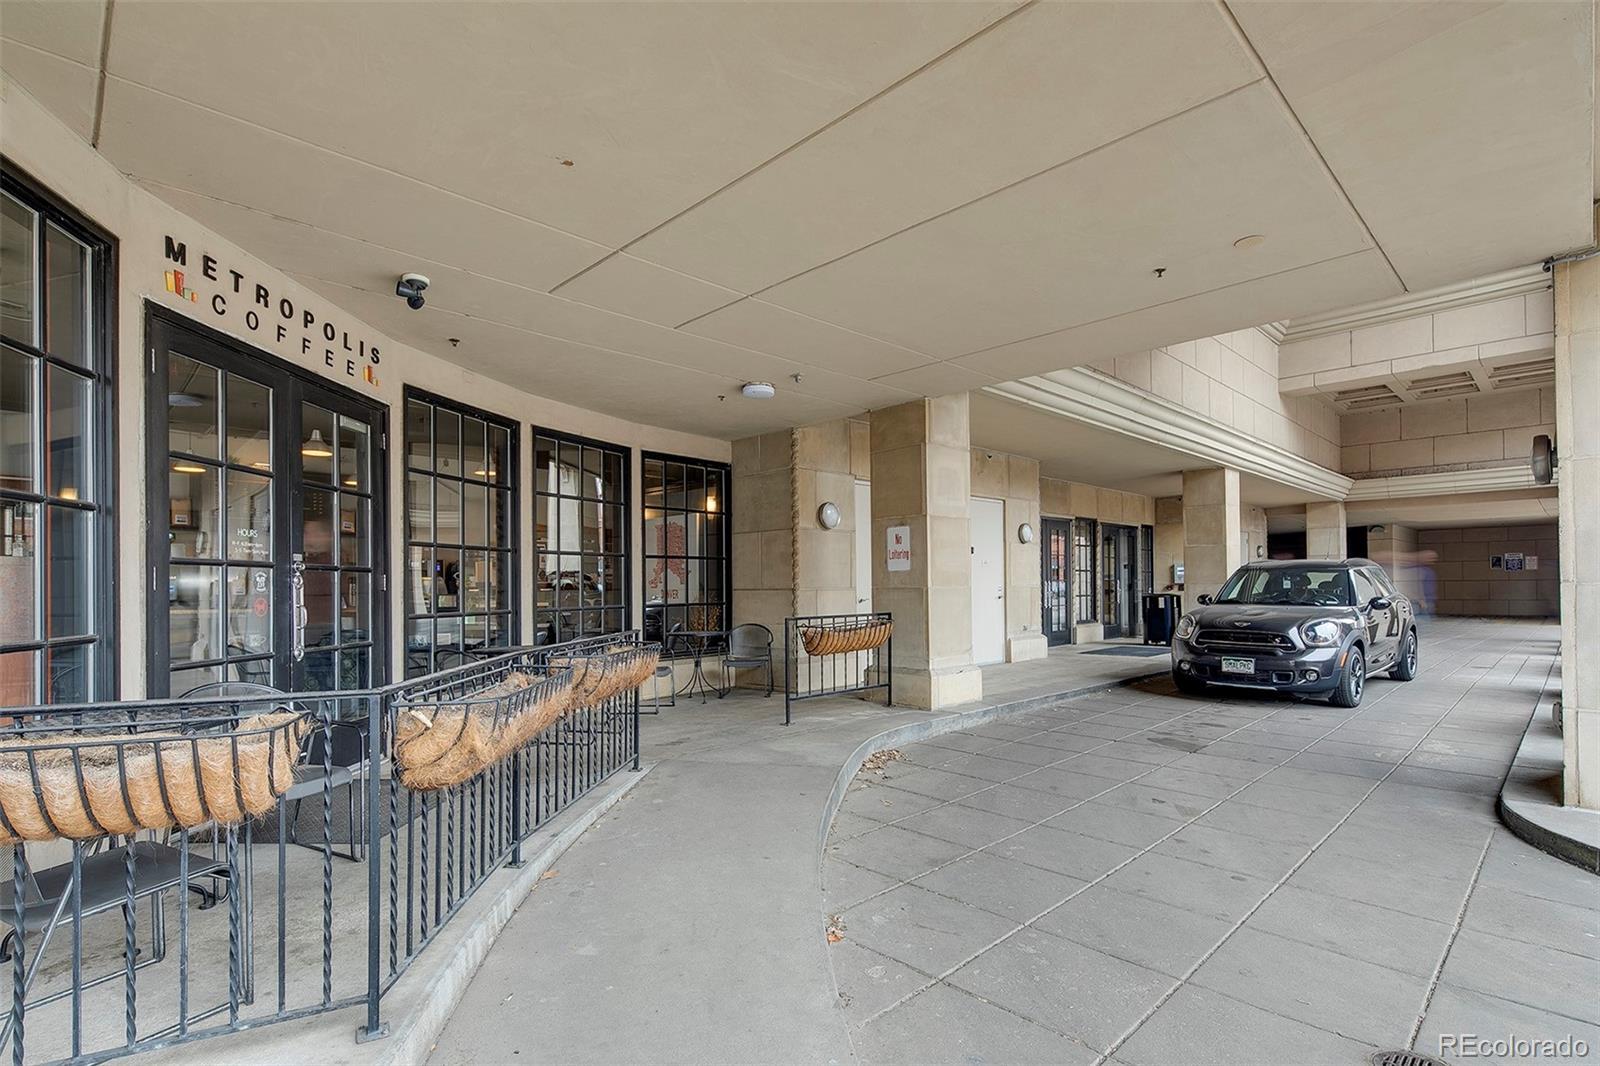 MLS# 2799823 - 22 - 300 W 11th Avenue #16A, Denver, CO 80204